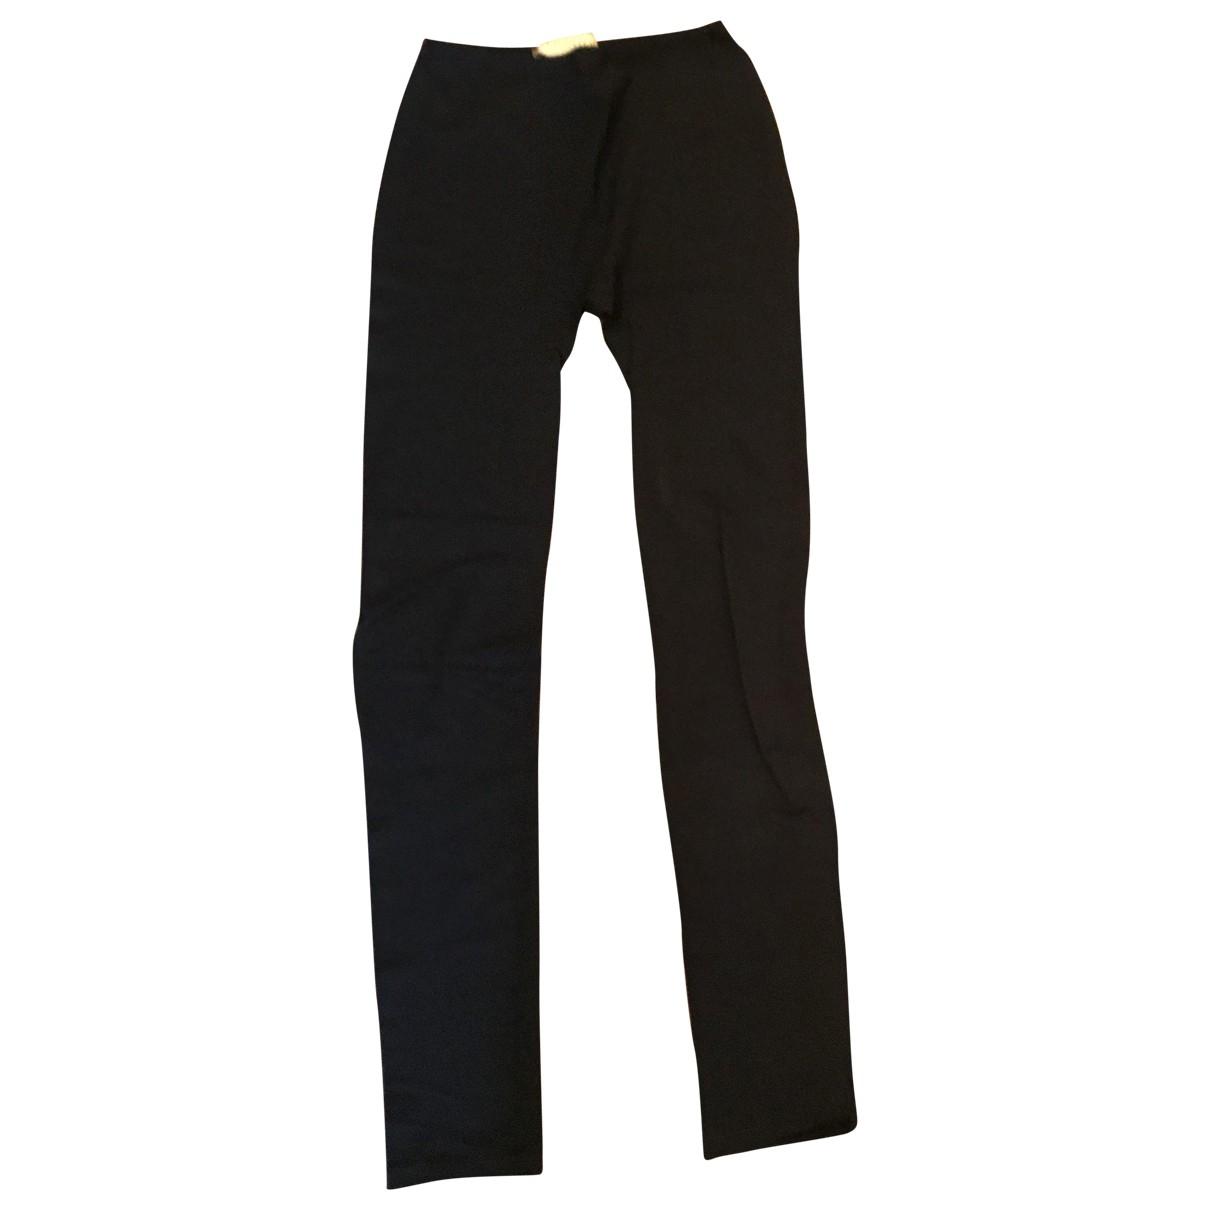 Valentino Garavani \N Black Trousers for Women XS International